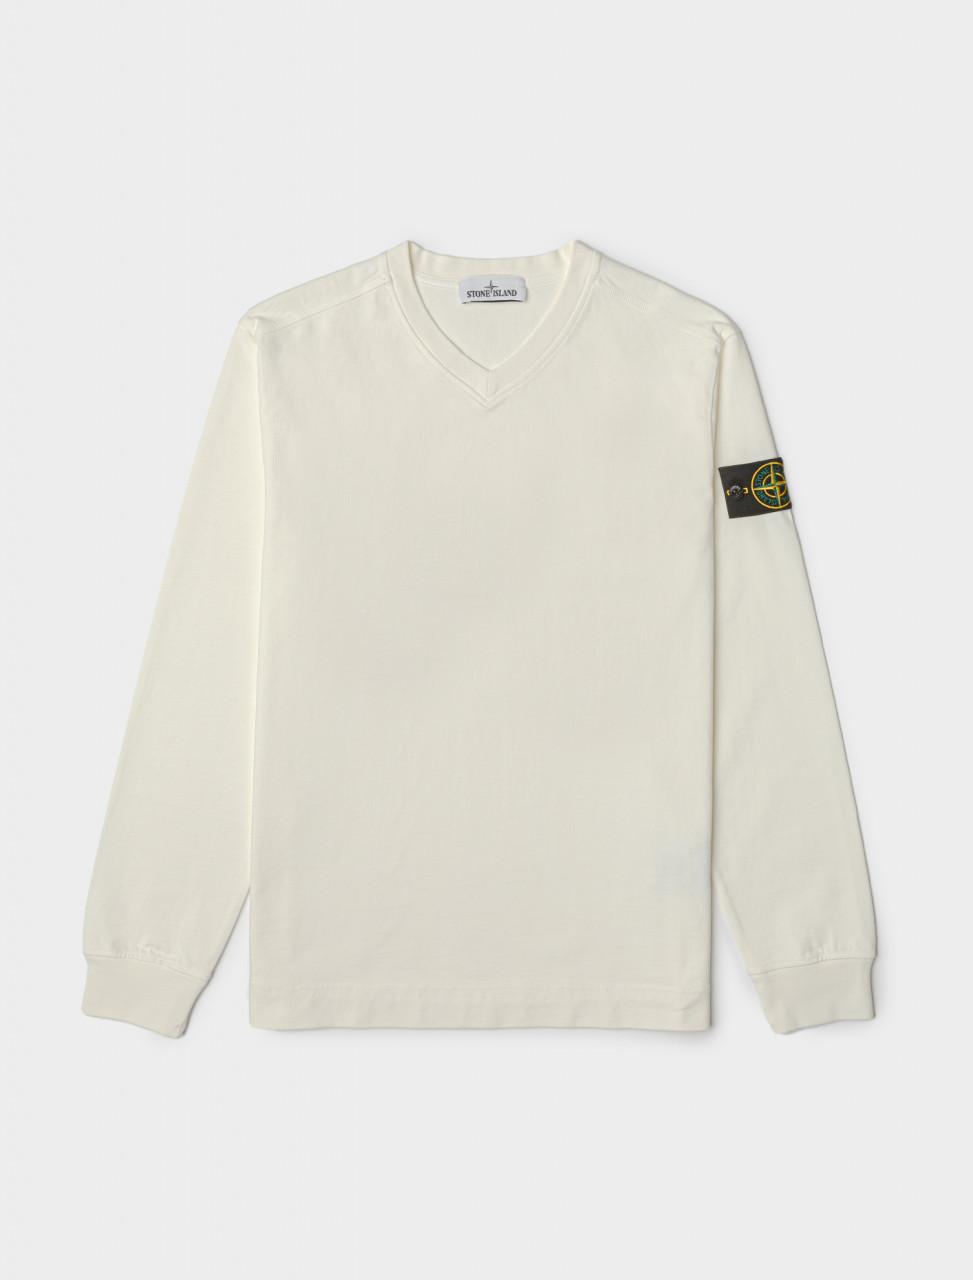 Cotton Sweatshirt in Ivory